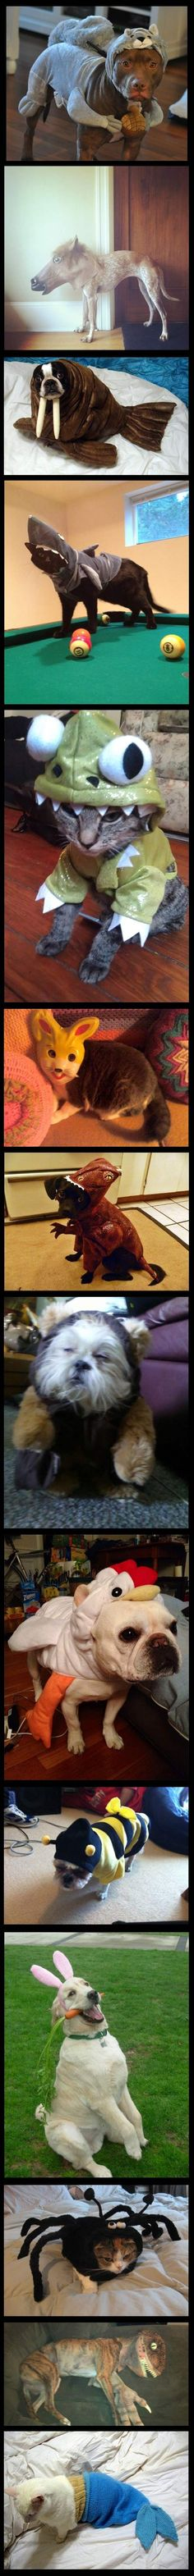 Animals dressed up as animals -